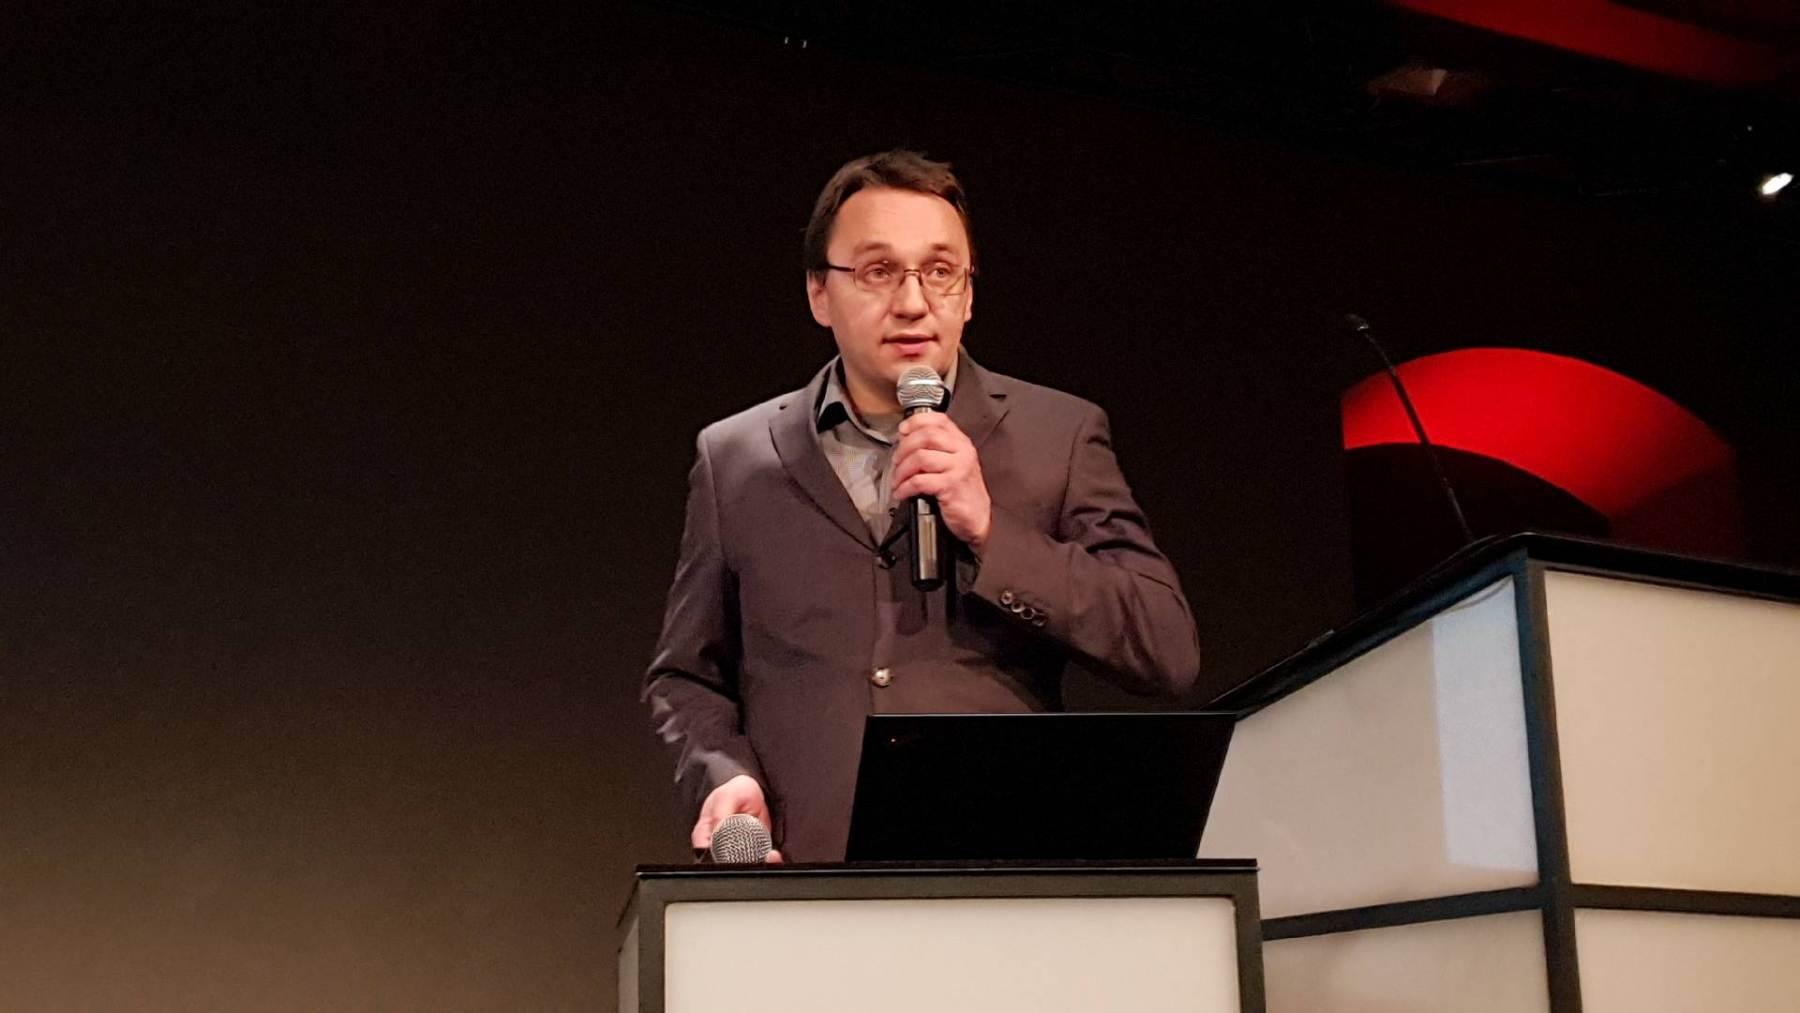 2018-12-07_Sprengseminar_Tirol_Nr_10